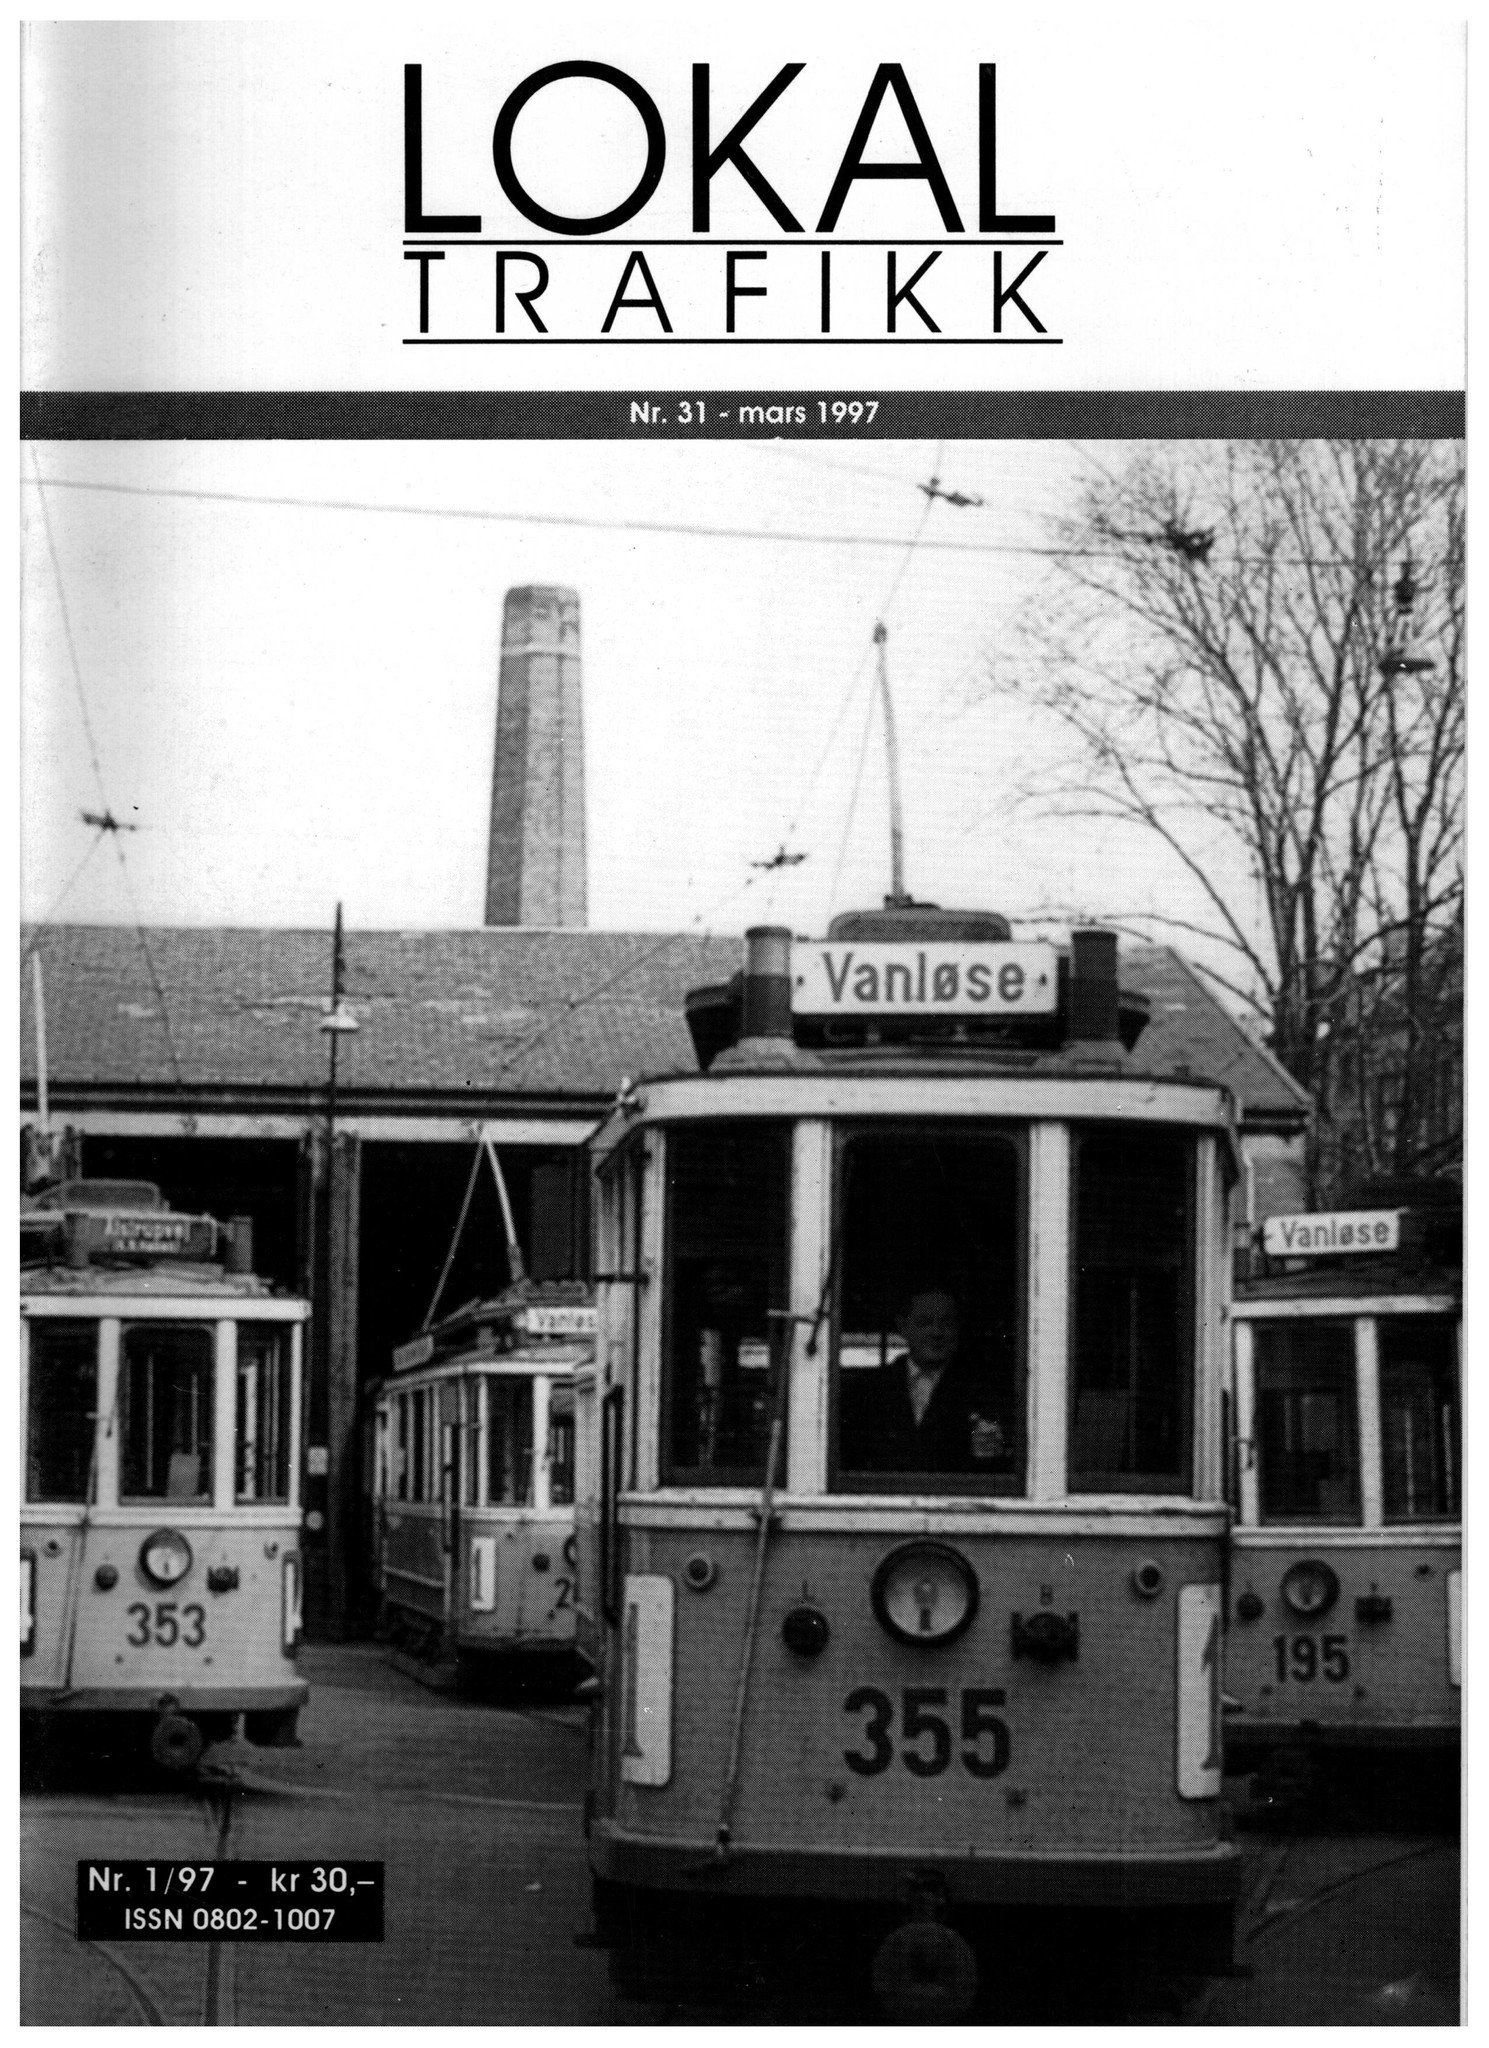 Lokaltrafikk #031